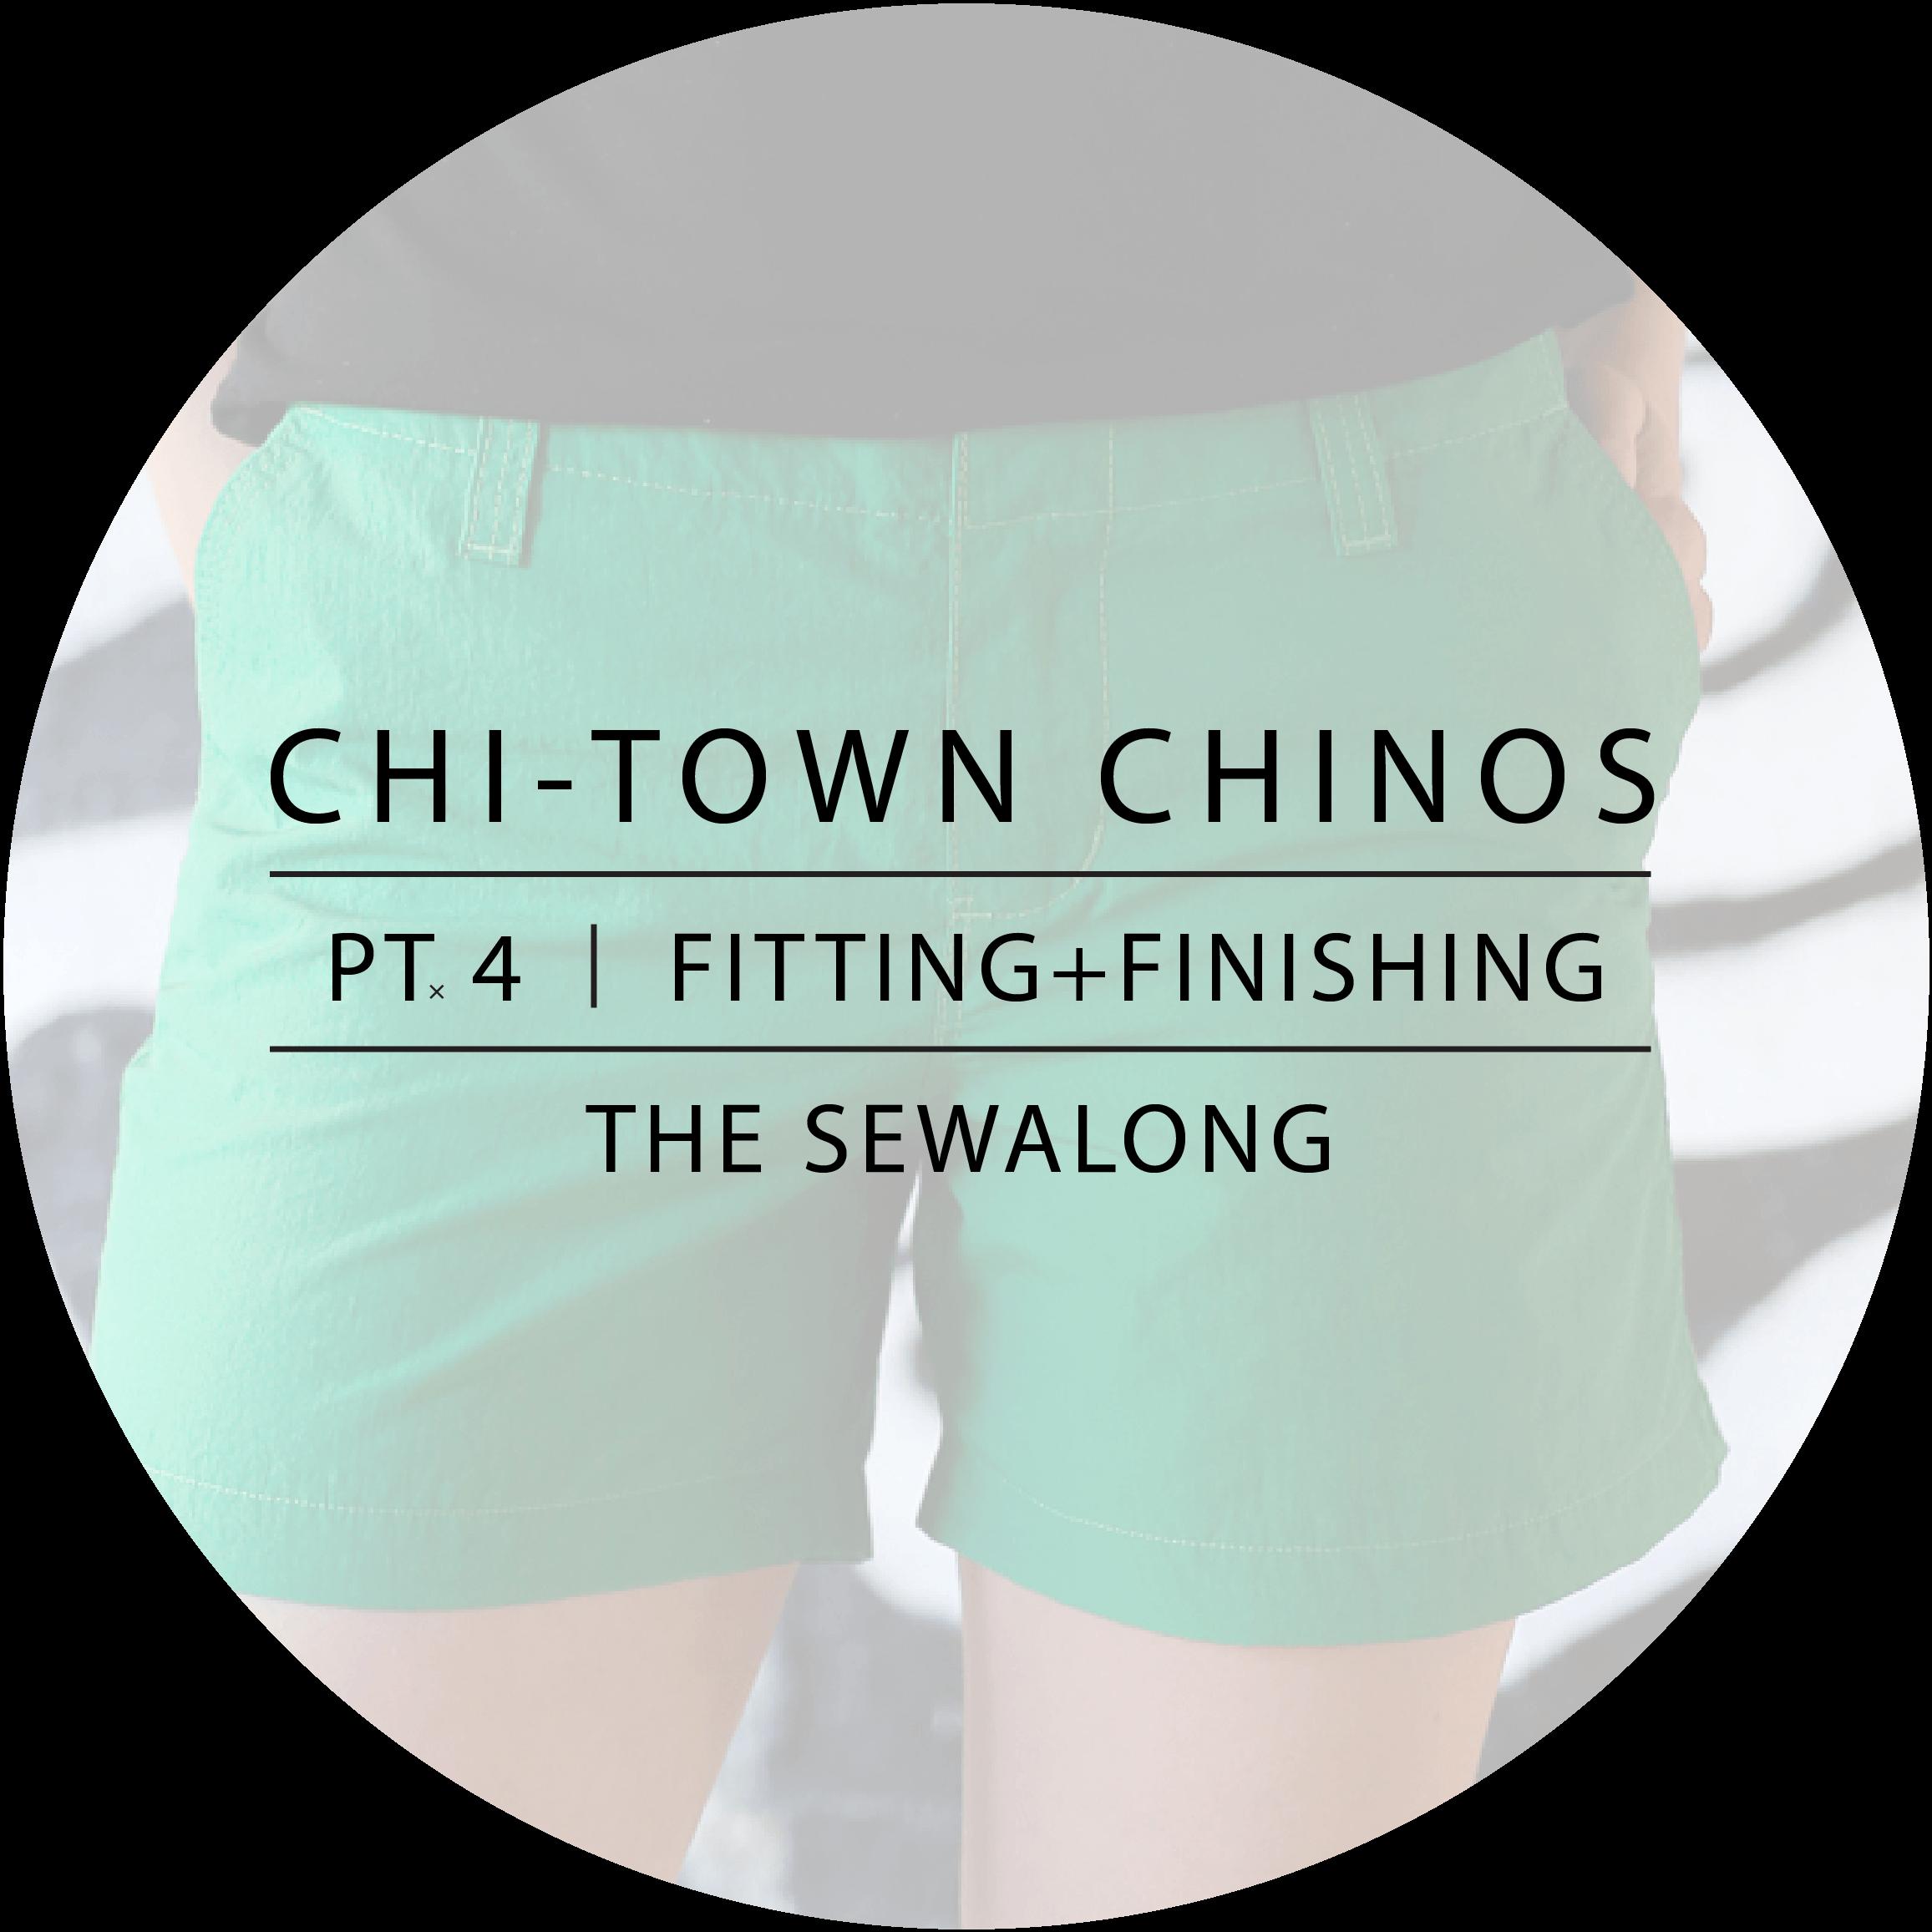 Chi-Town Chinos Sewalong Pt. 4